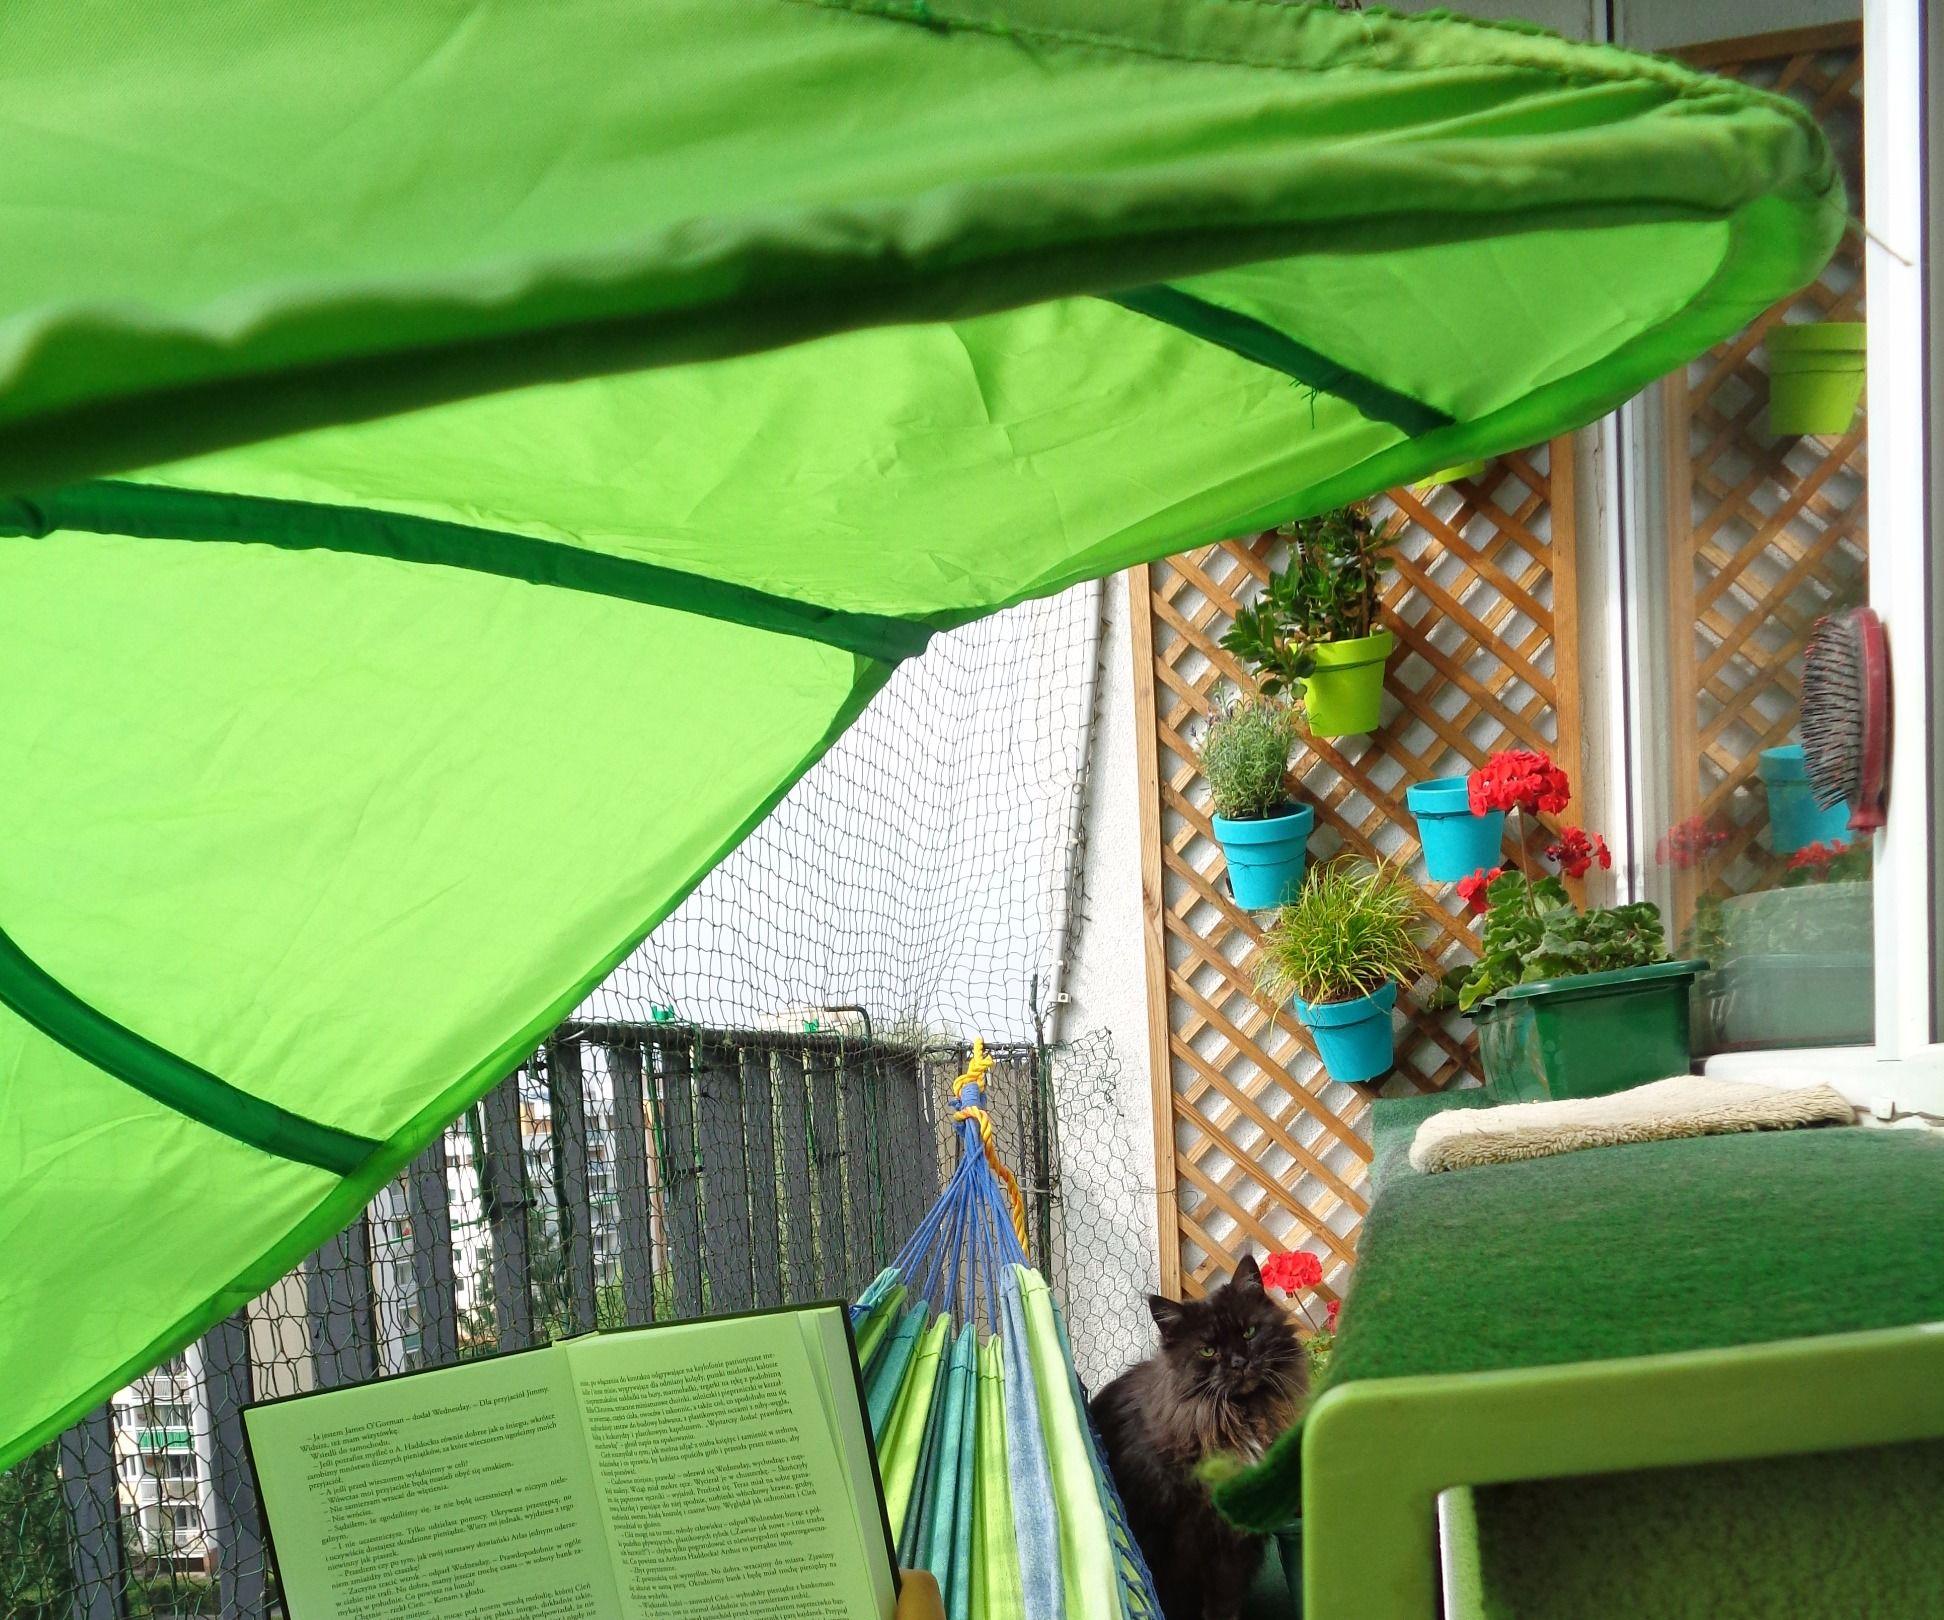 Summer Reading Nook (in Big City)